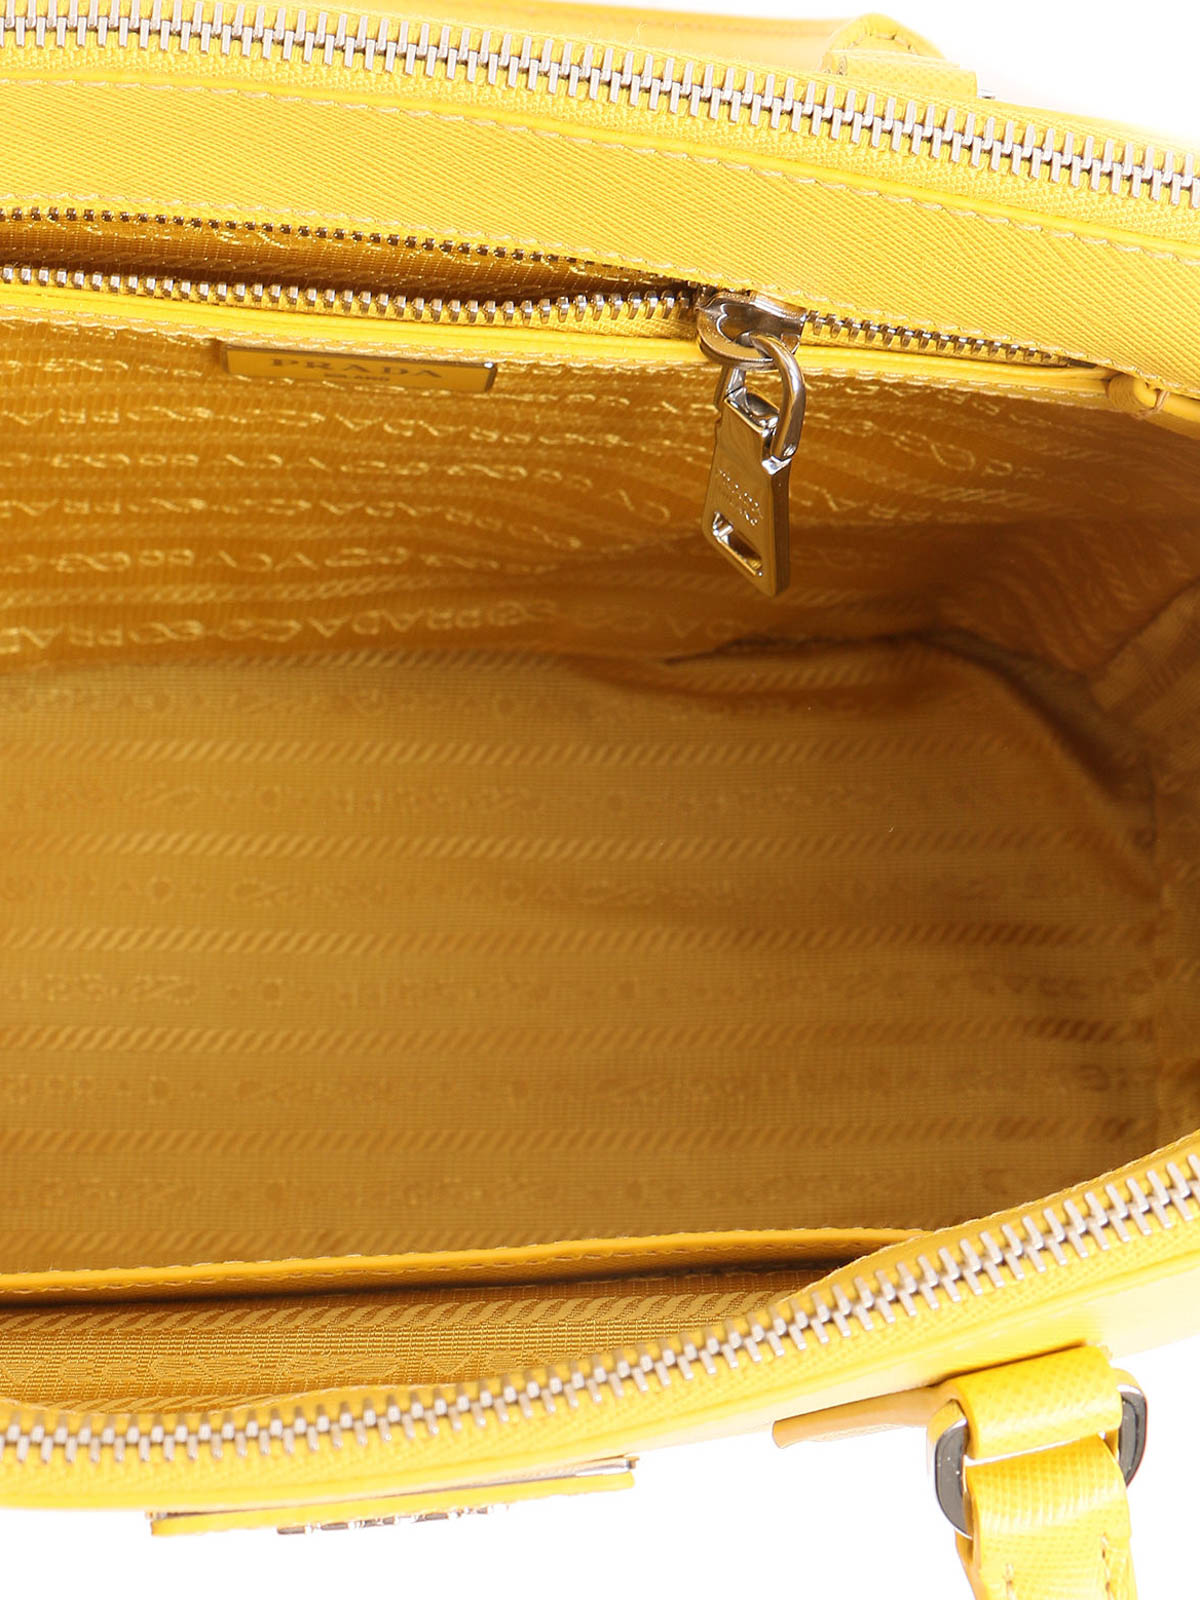 b8f5bbe436a Prada - Saffiano leather medium tote - totes bags - 1BA863NZV DLC